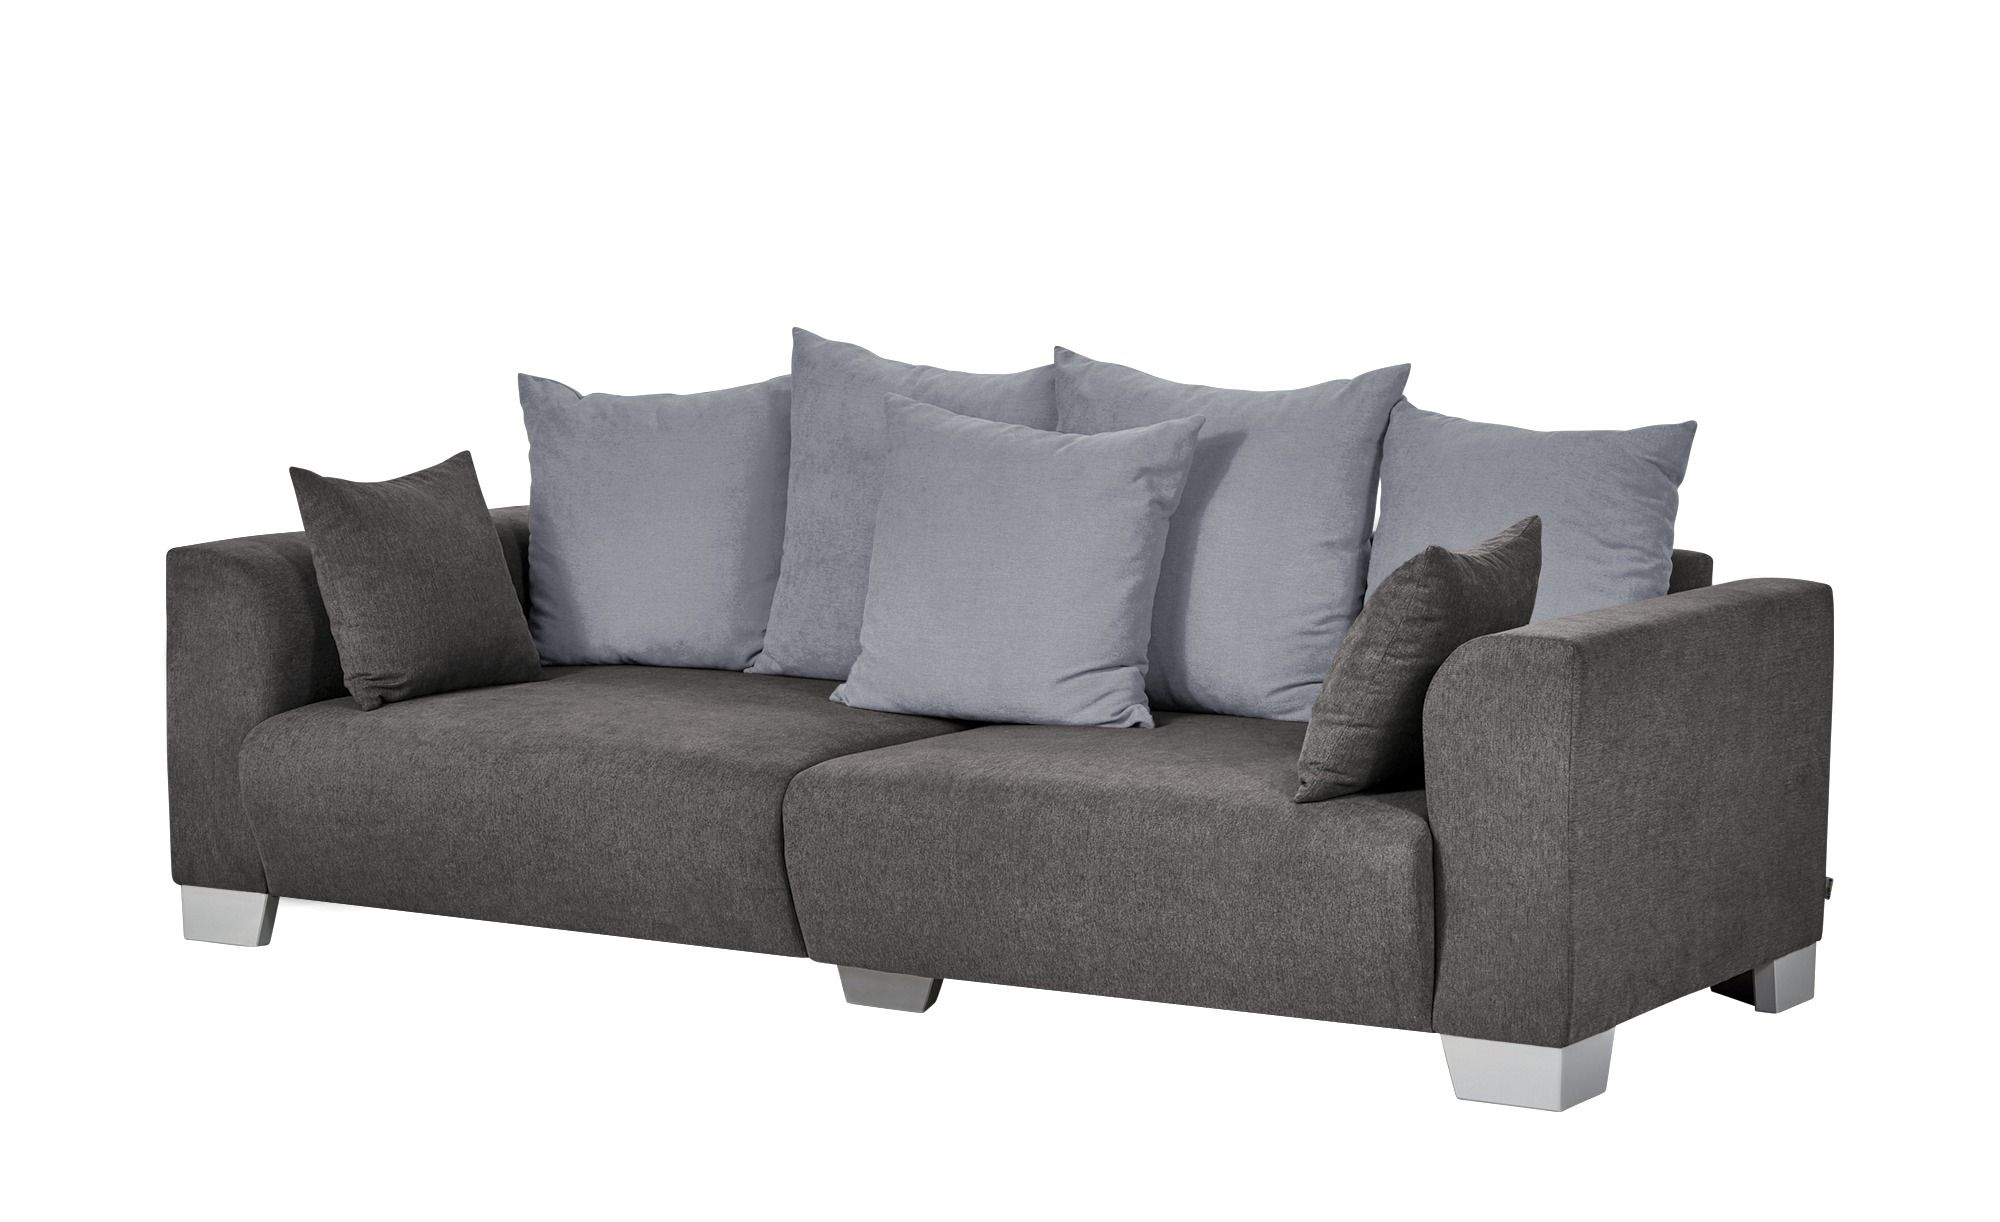 Smart Big Sofa Grau Braun Flachgewebe Tonja Grosse Sofas Sofa Und Big Sofa Grau